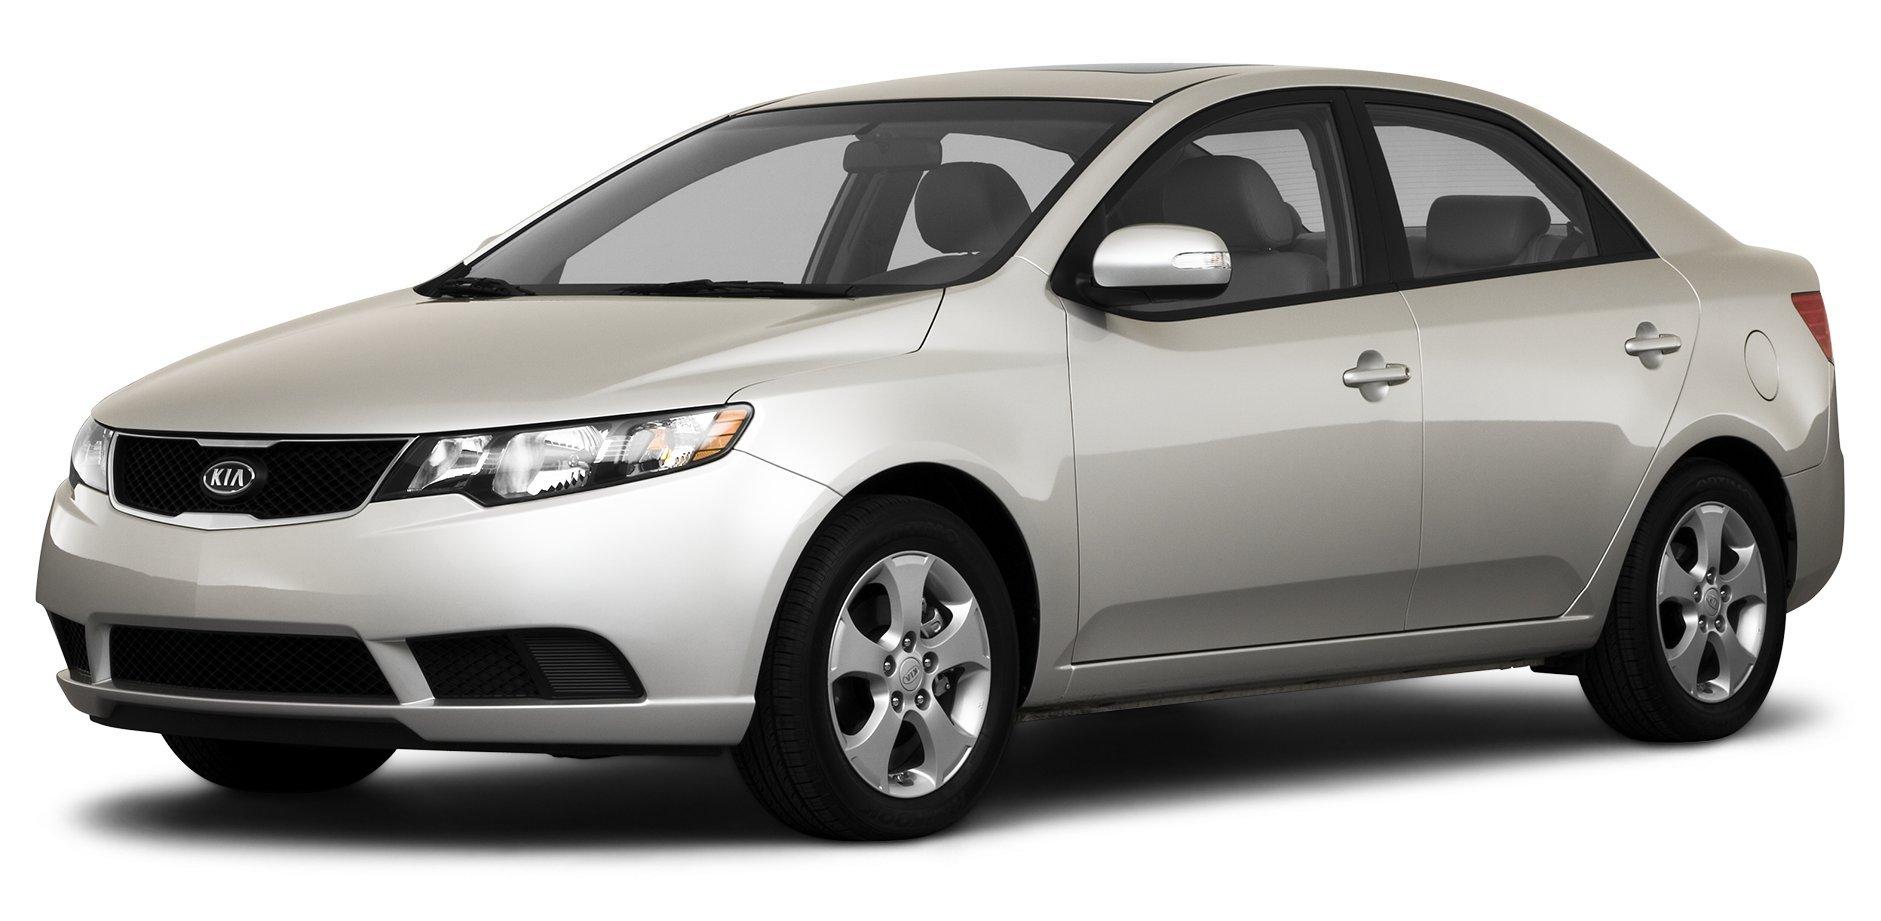 2010 Kia Forte EX, 4 Door Sedan Automatic Transmission ...